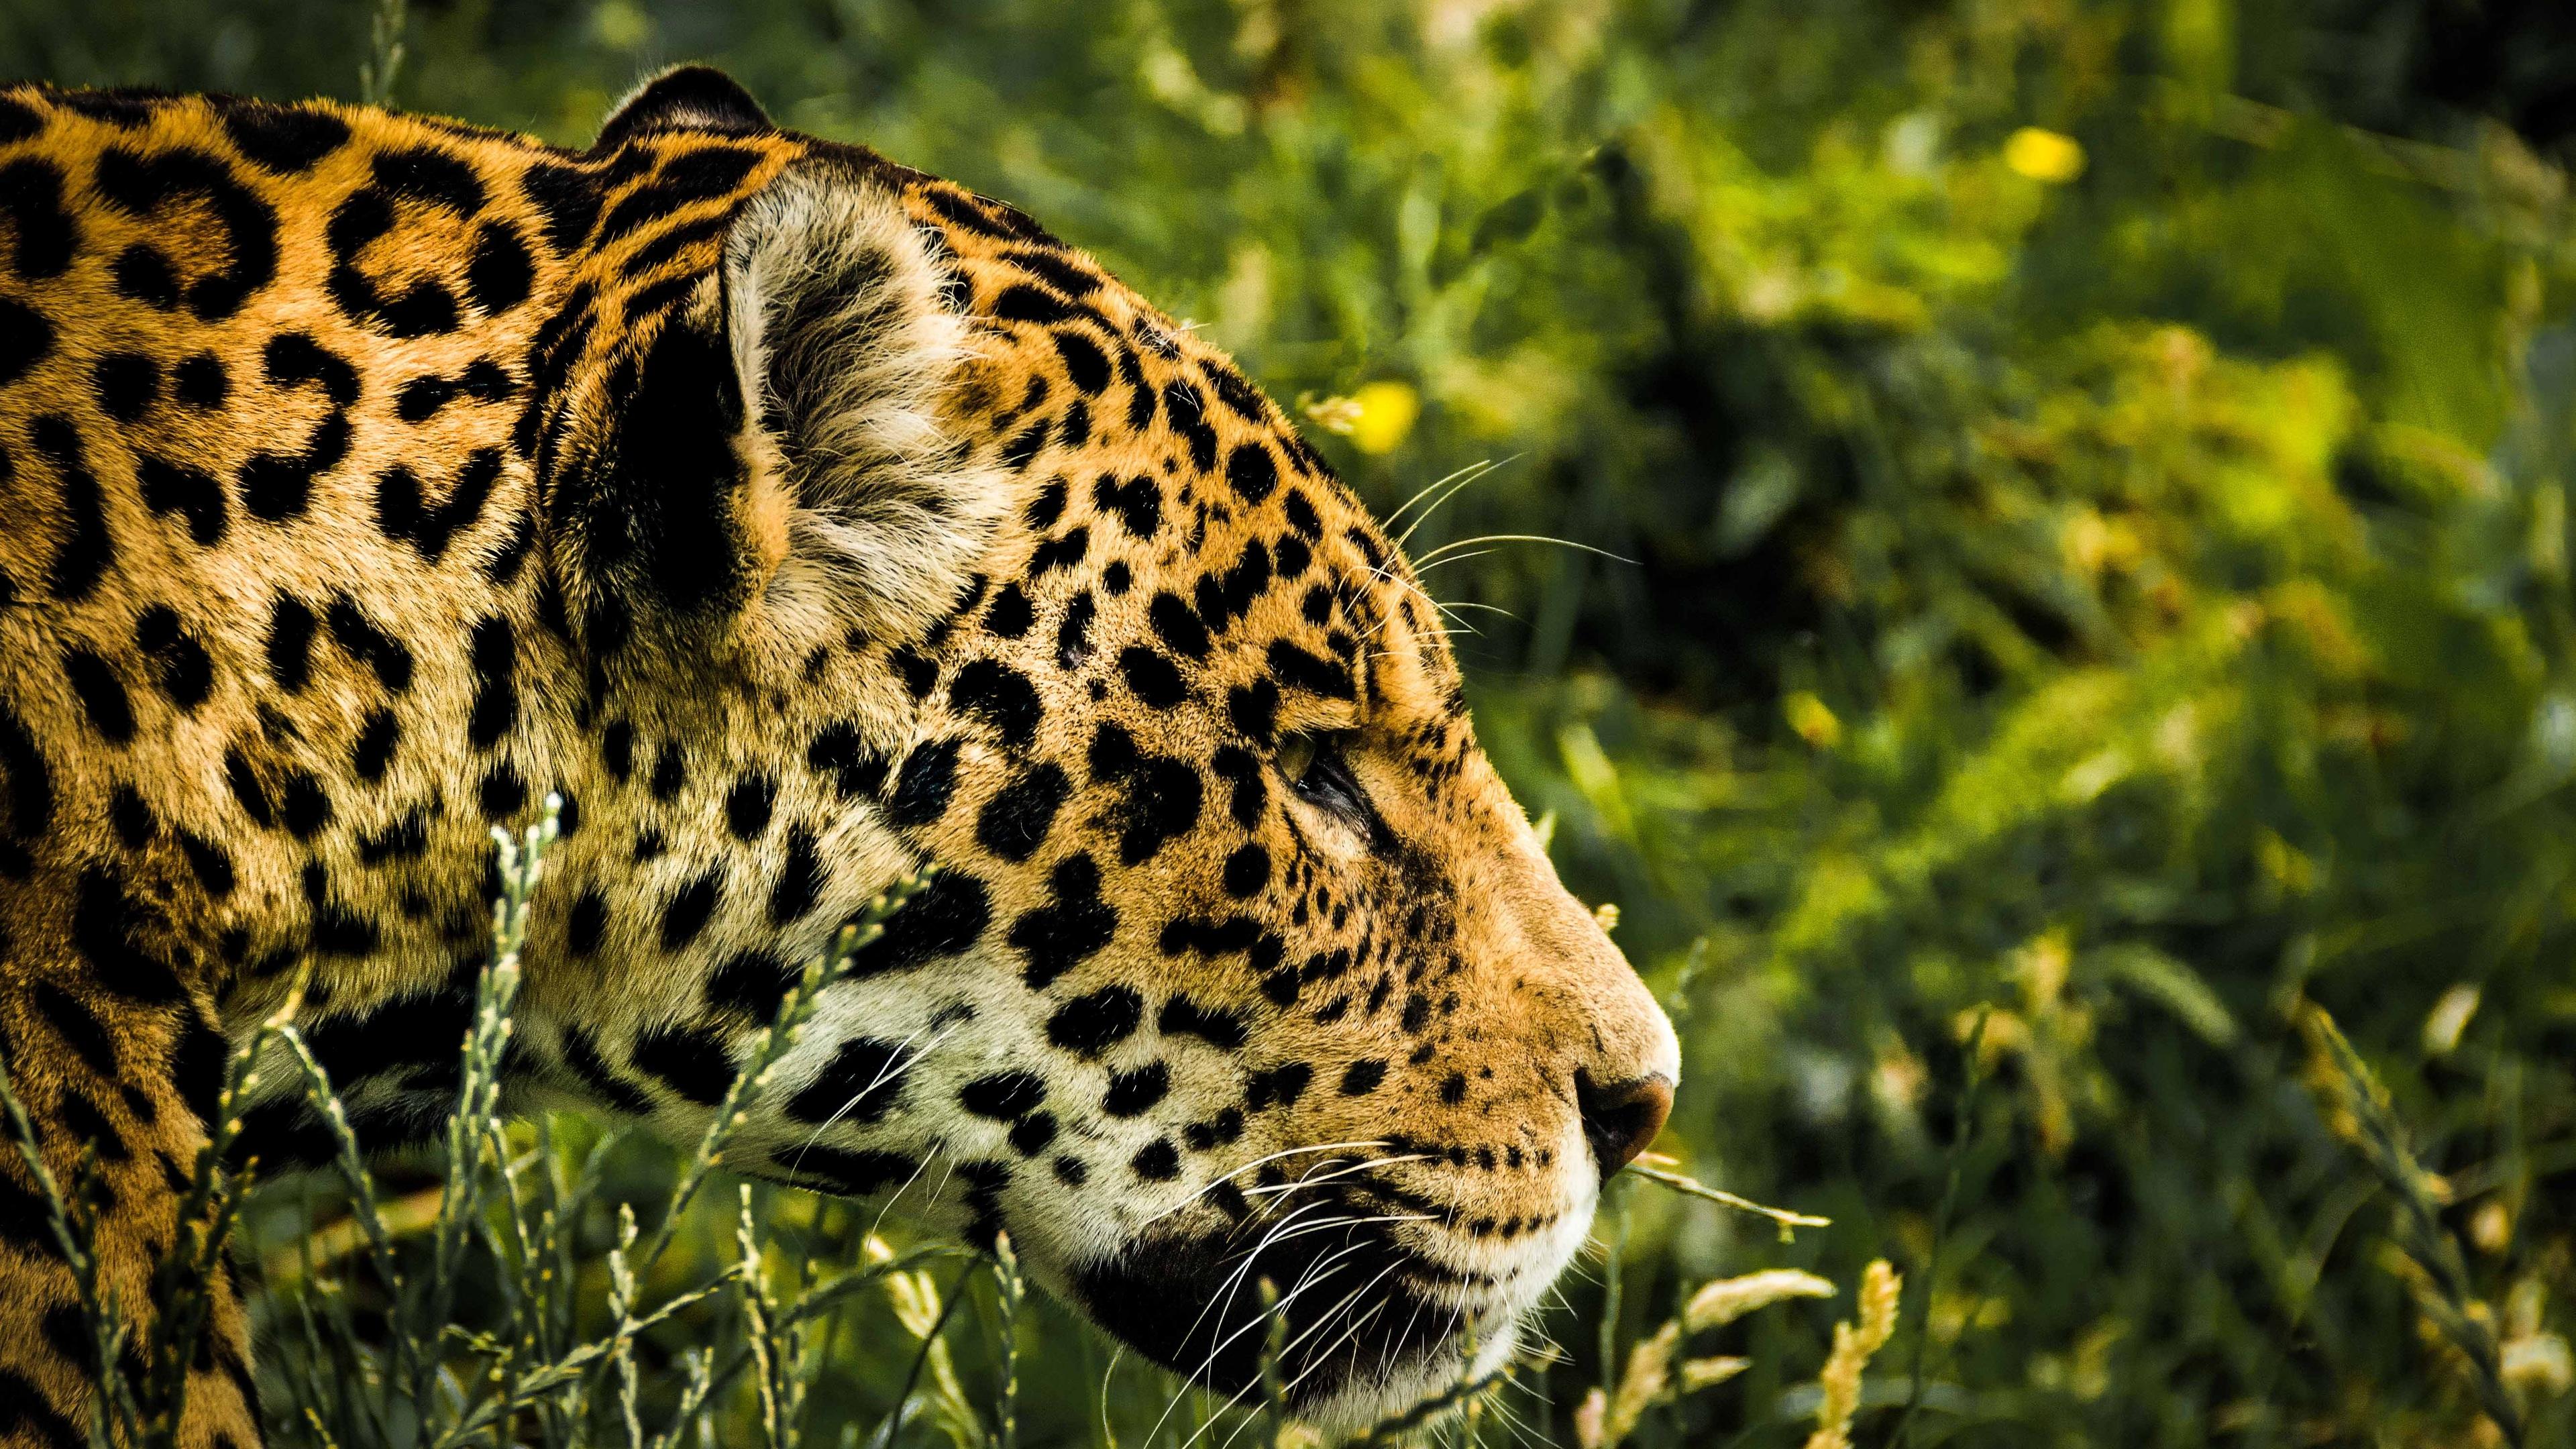 jaguar wild 1542238393 - Jaguar Wild - jaguar wallpapers, hd-wallpapers, animals wallpapers